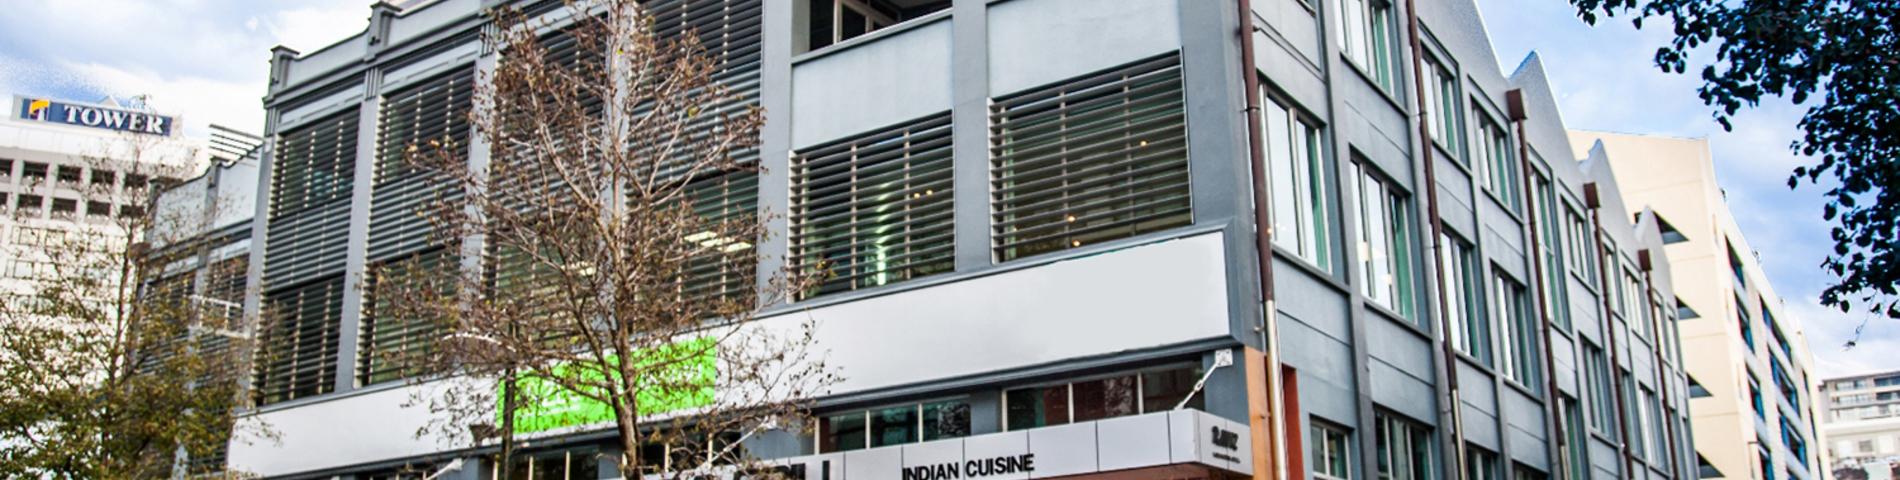 NZLC New Zealand Language Centres 사진 1